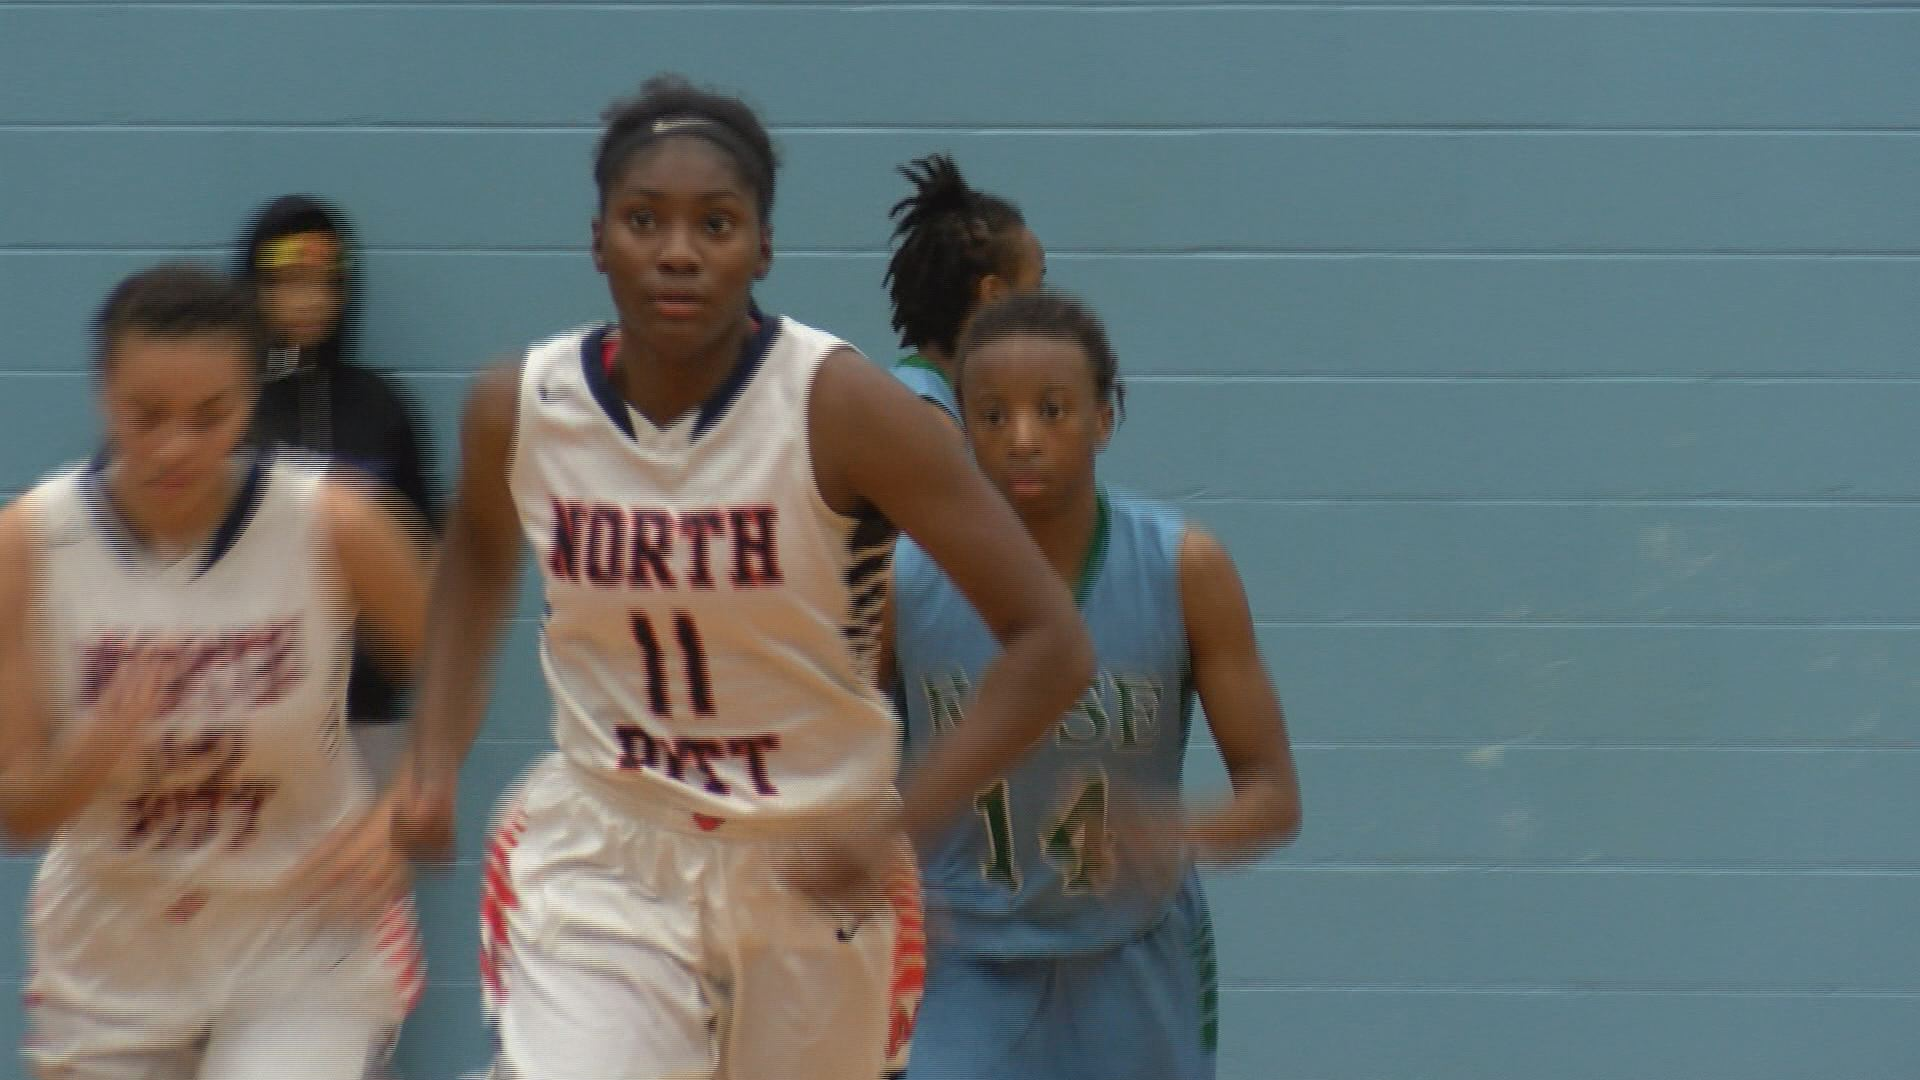 north-pitt-girls-basketball_320701